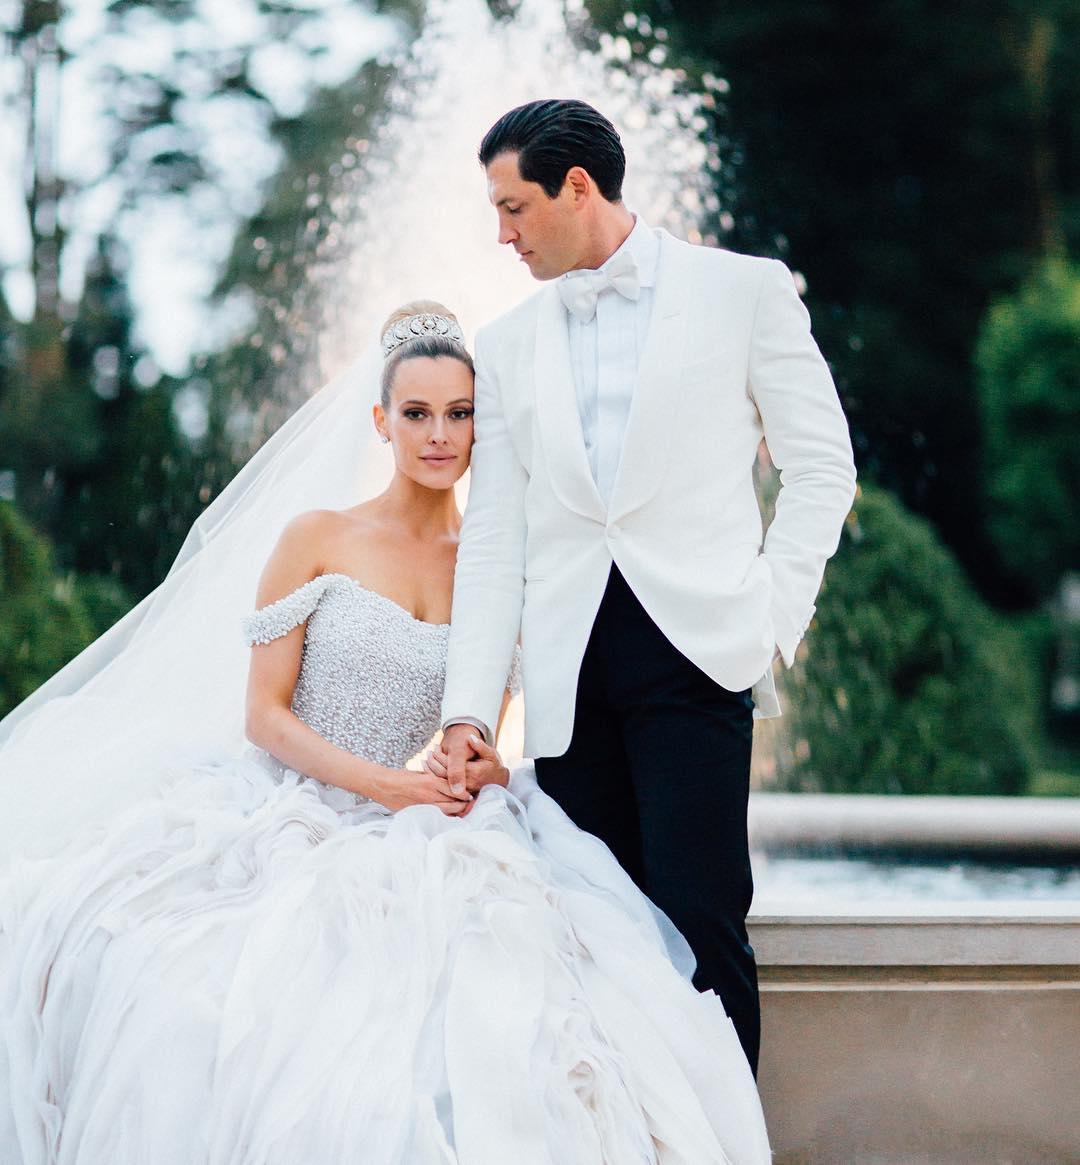 Lindsay Arnold Wedding.Peta Murgatroyd And Maksim Chmerkovskiy Dancing With The Stars